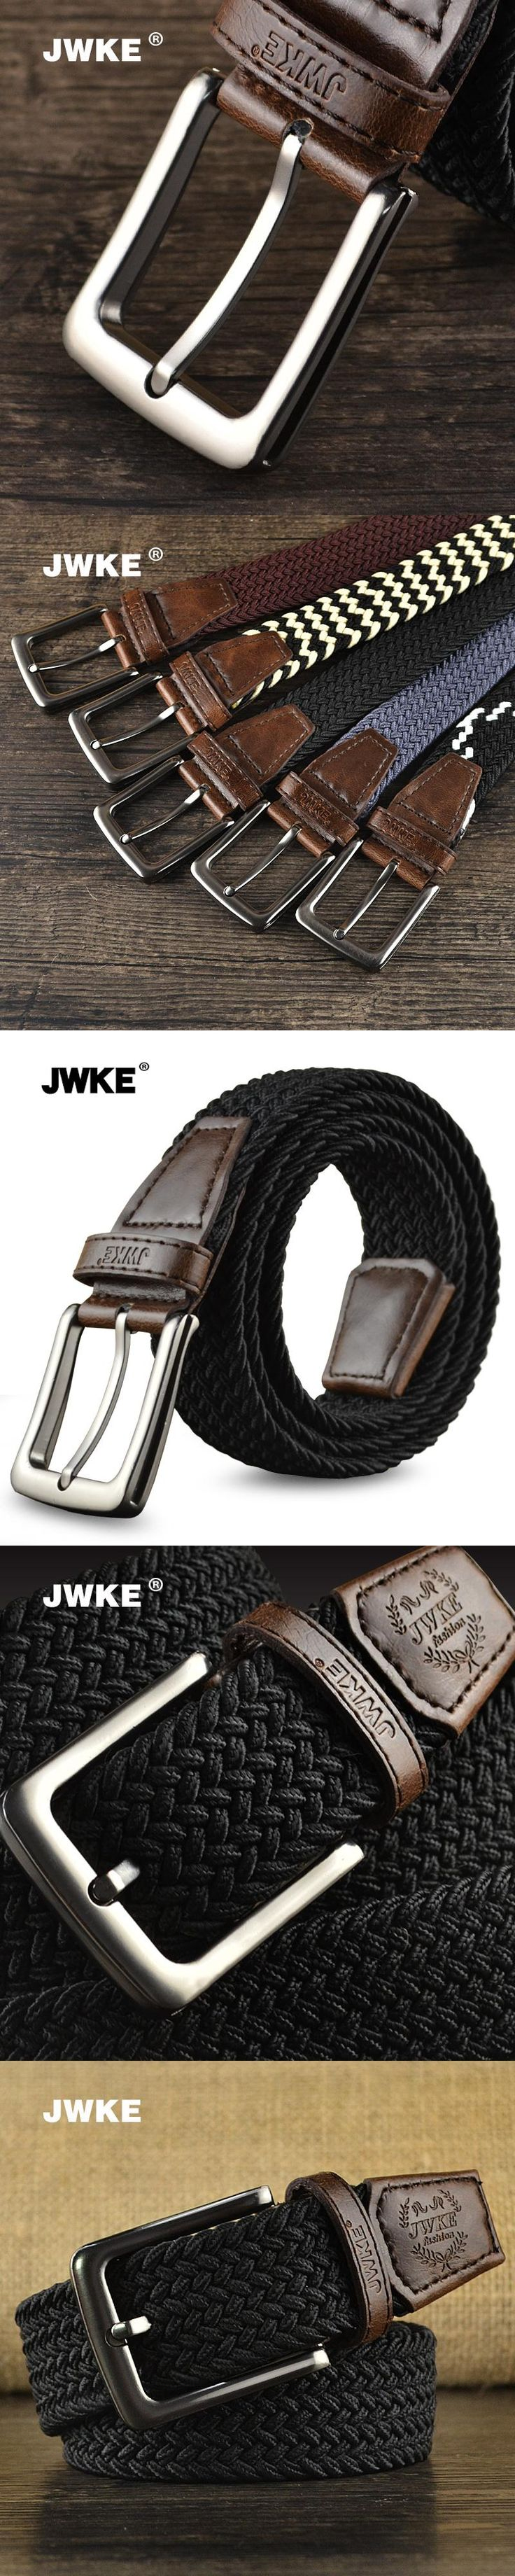 JWKE men's casual elastic belt buckle male canvas woven belt belt all-match trend of Korean youth 5 COLOUR